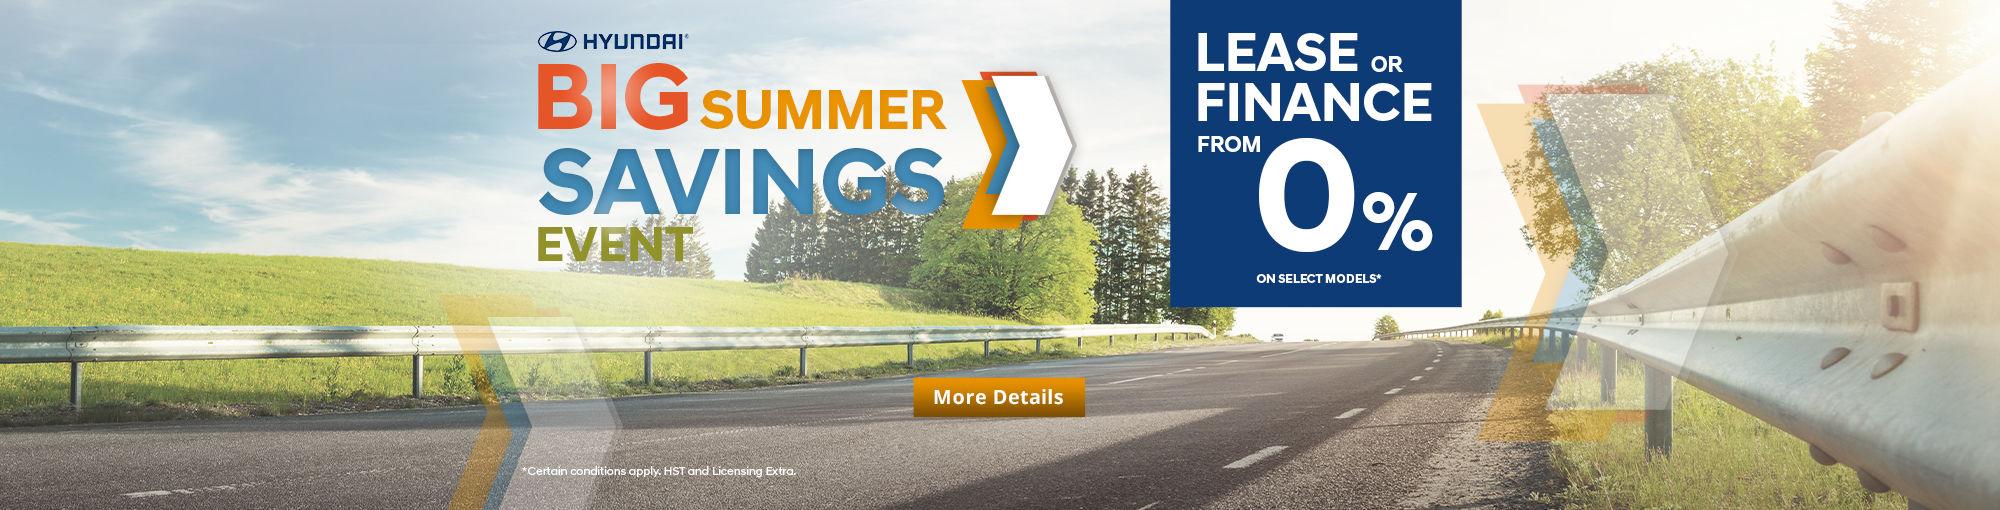 Big Summer Savings Event